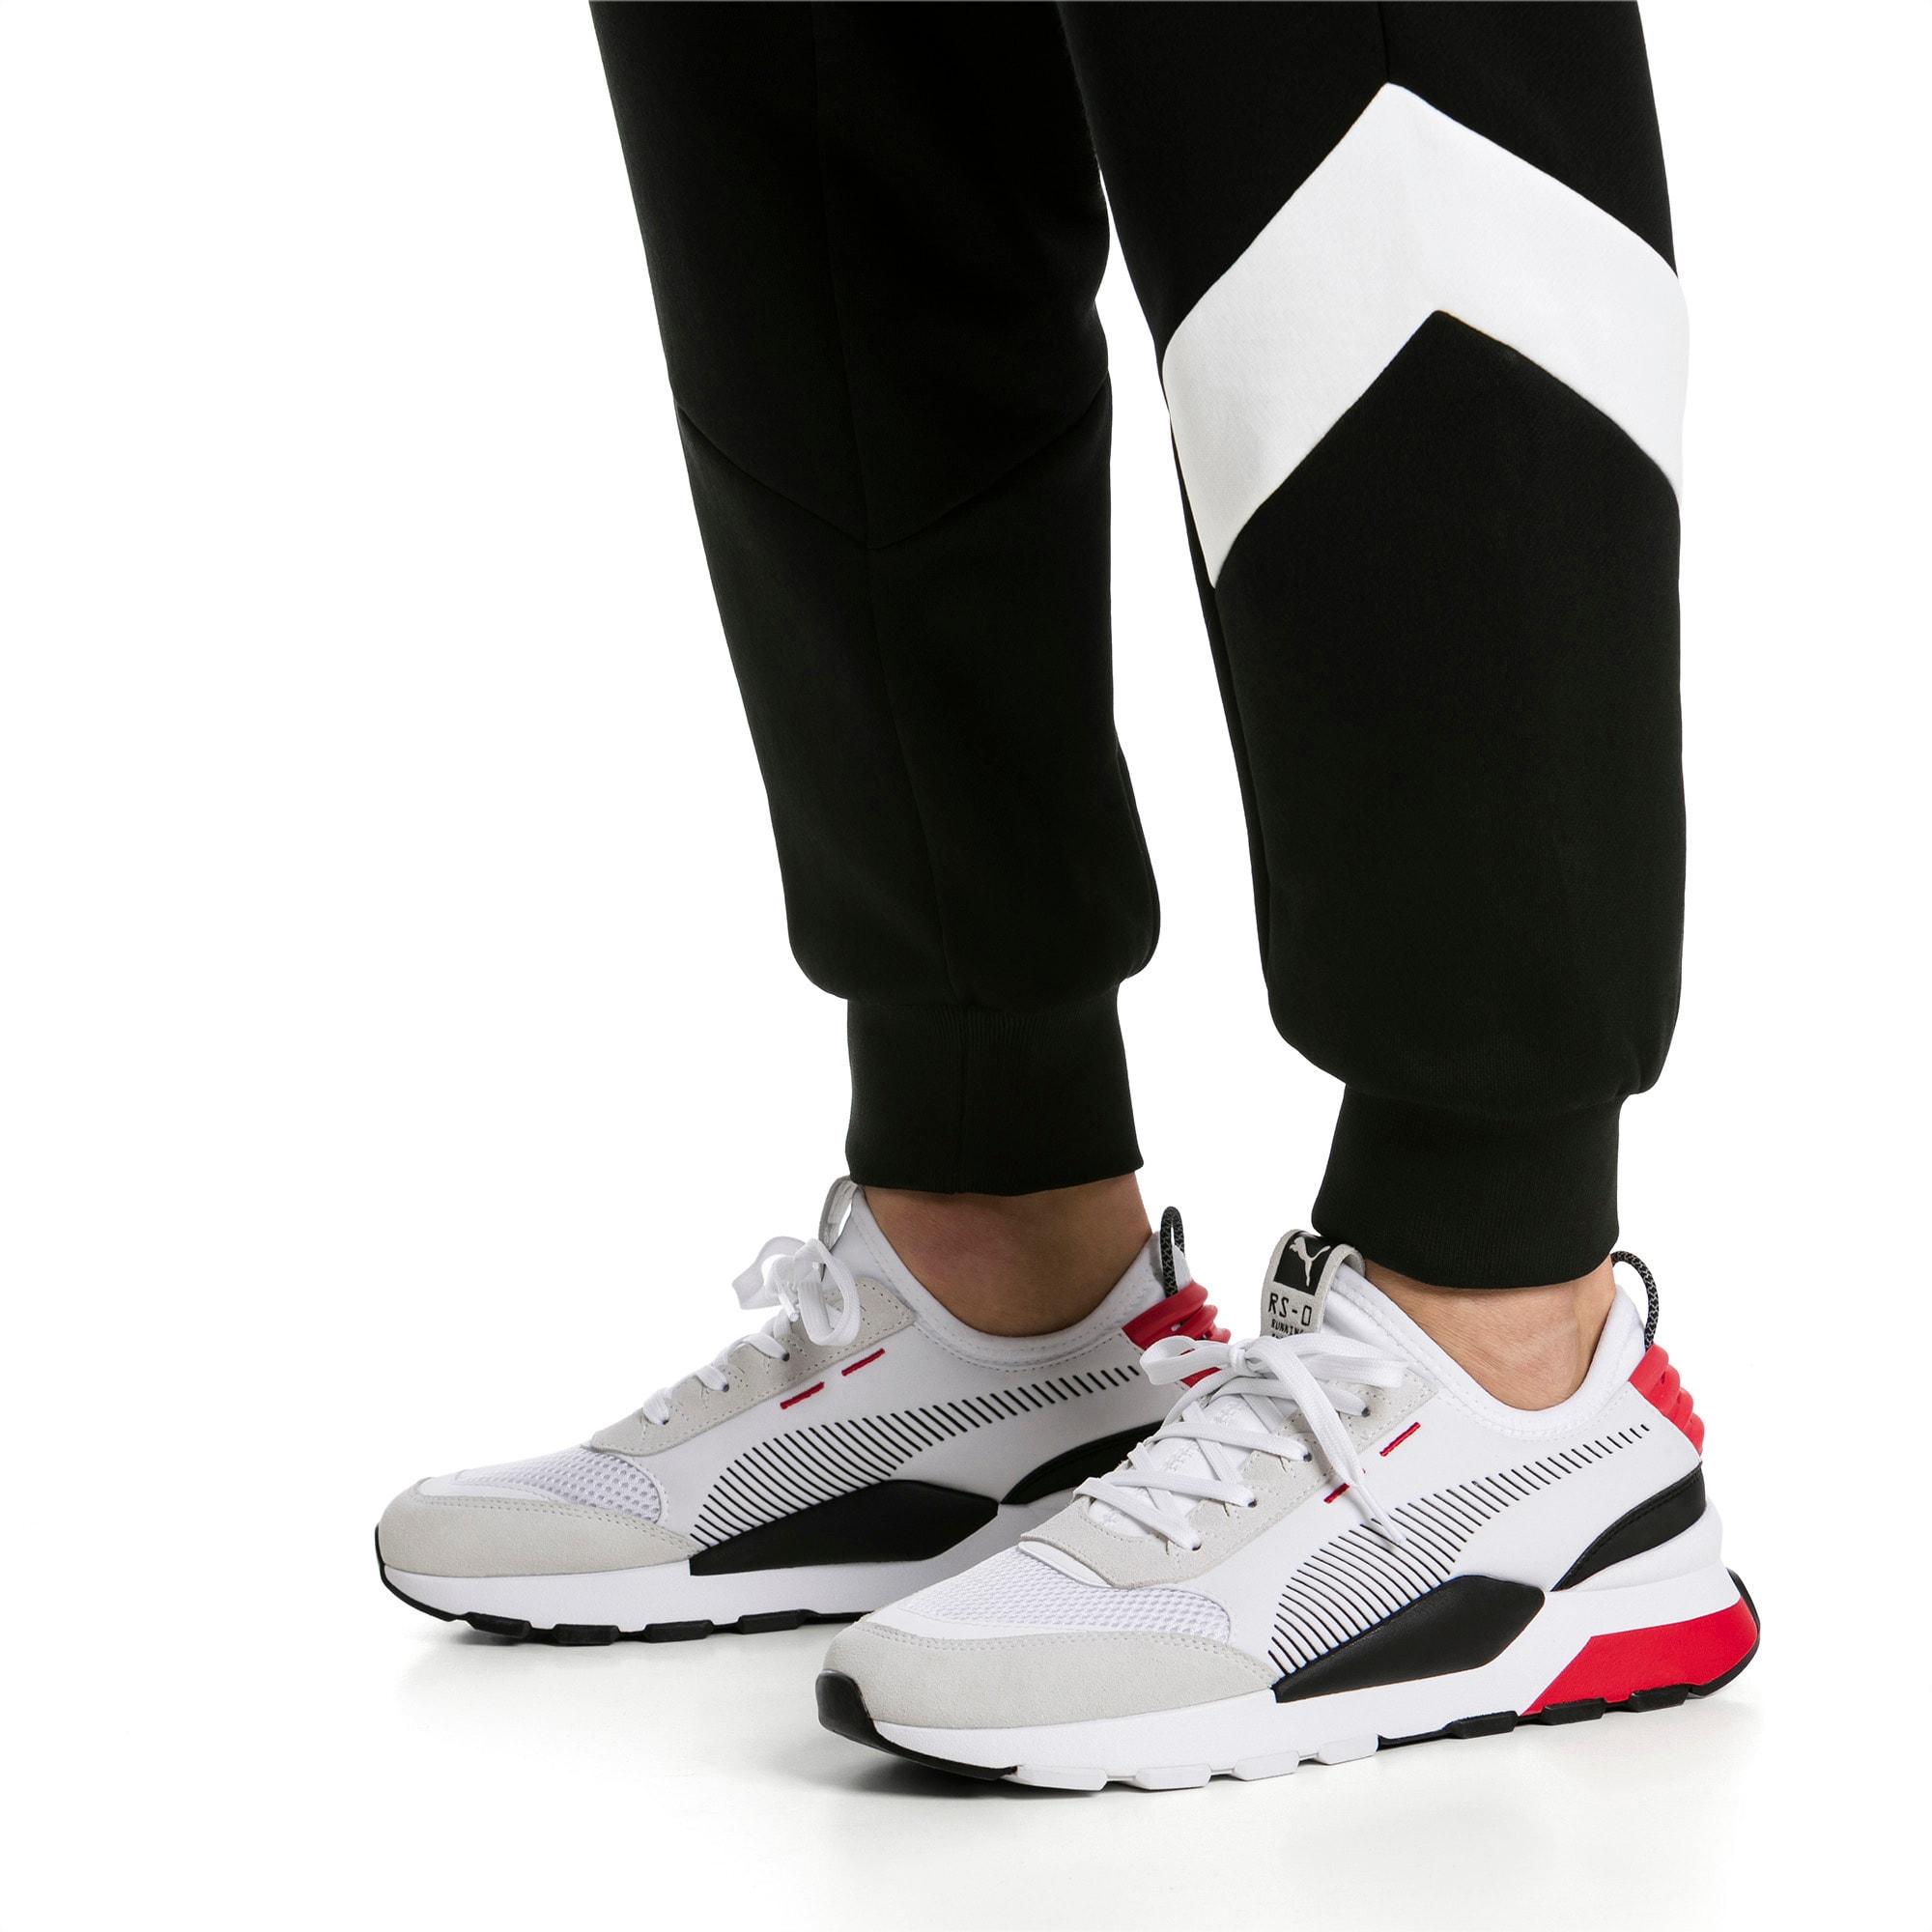 RS-O Winter Inj Toys Men's Sneakers